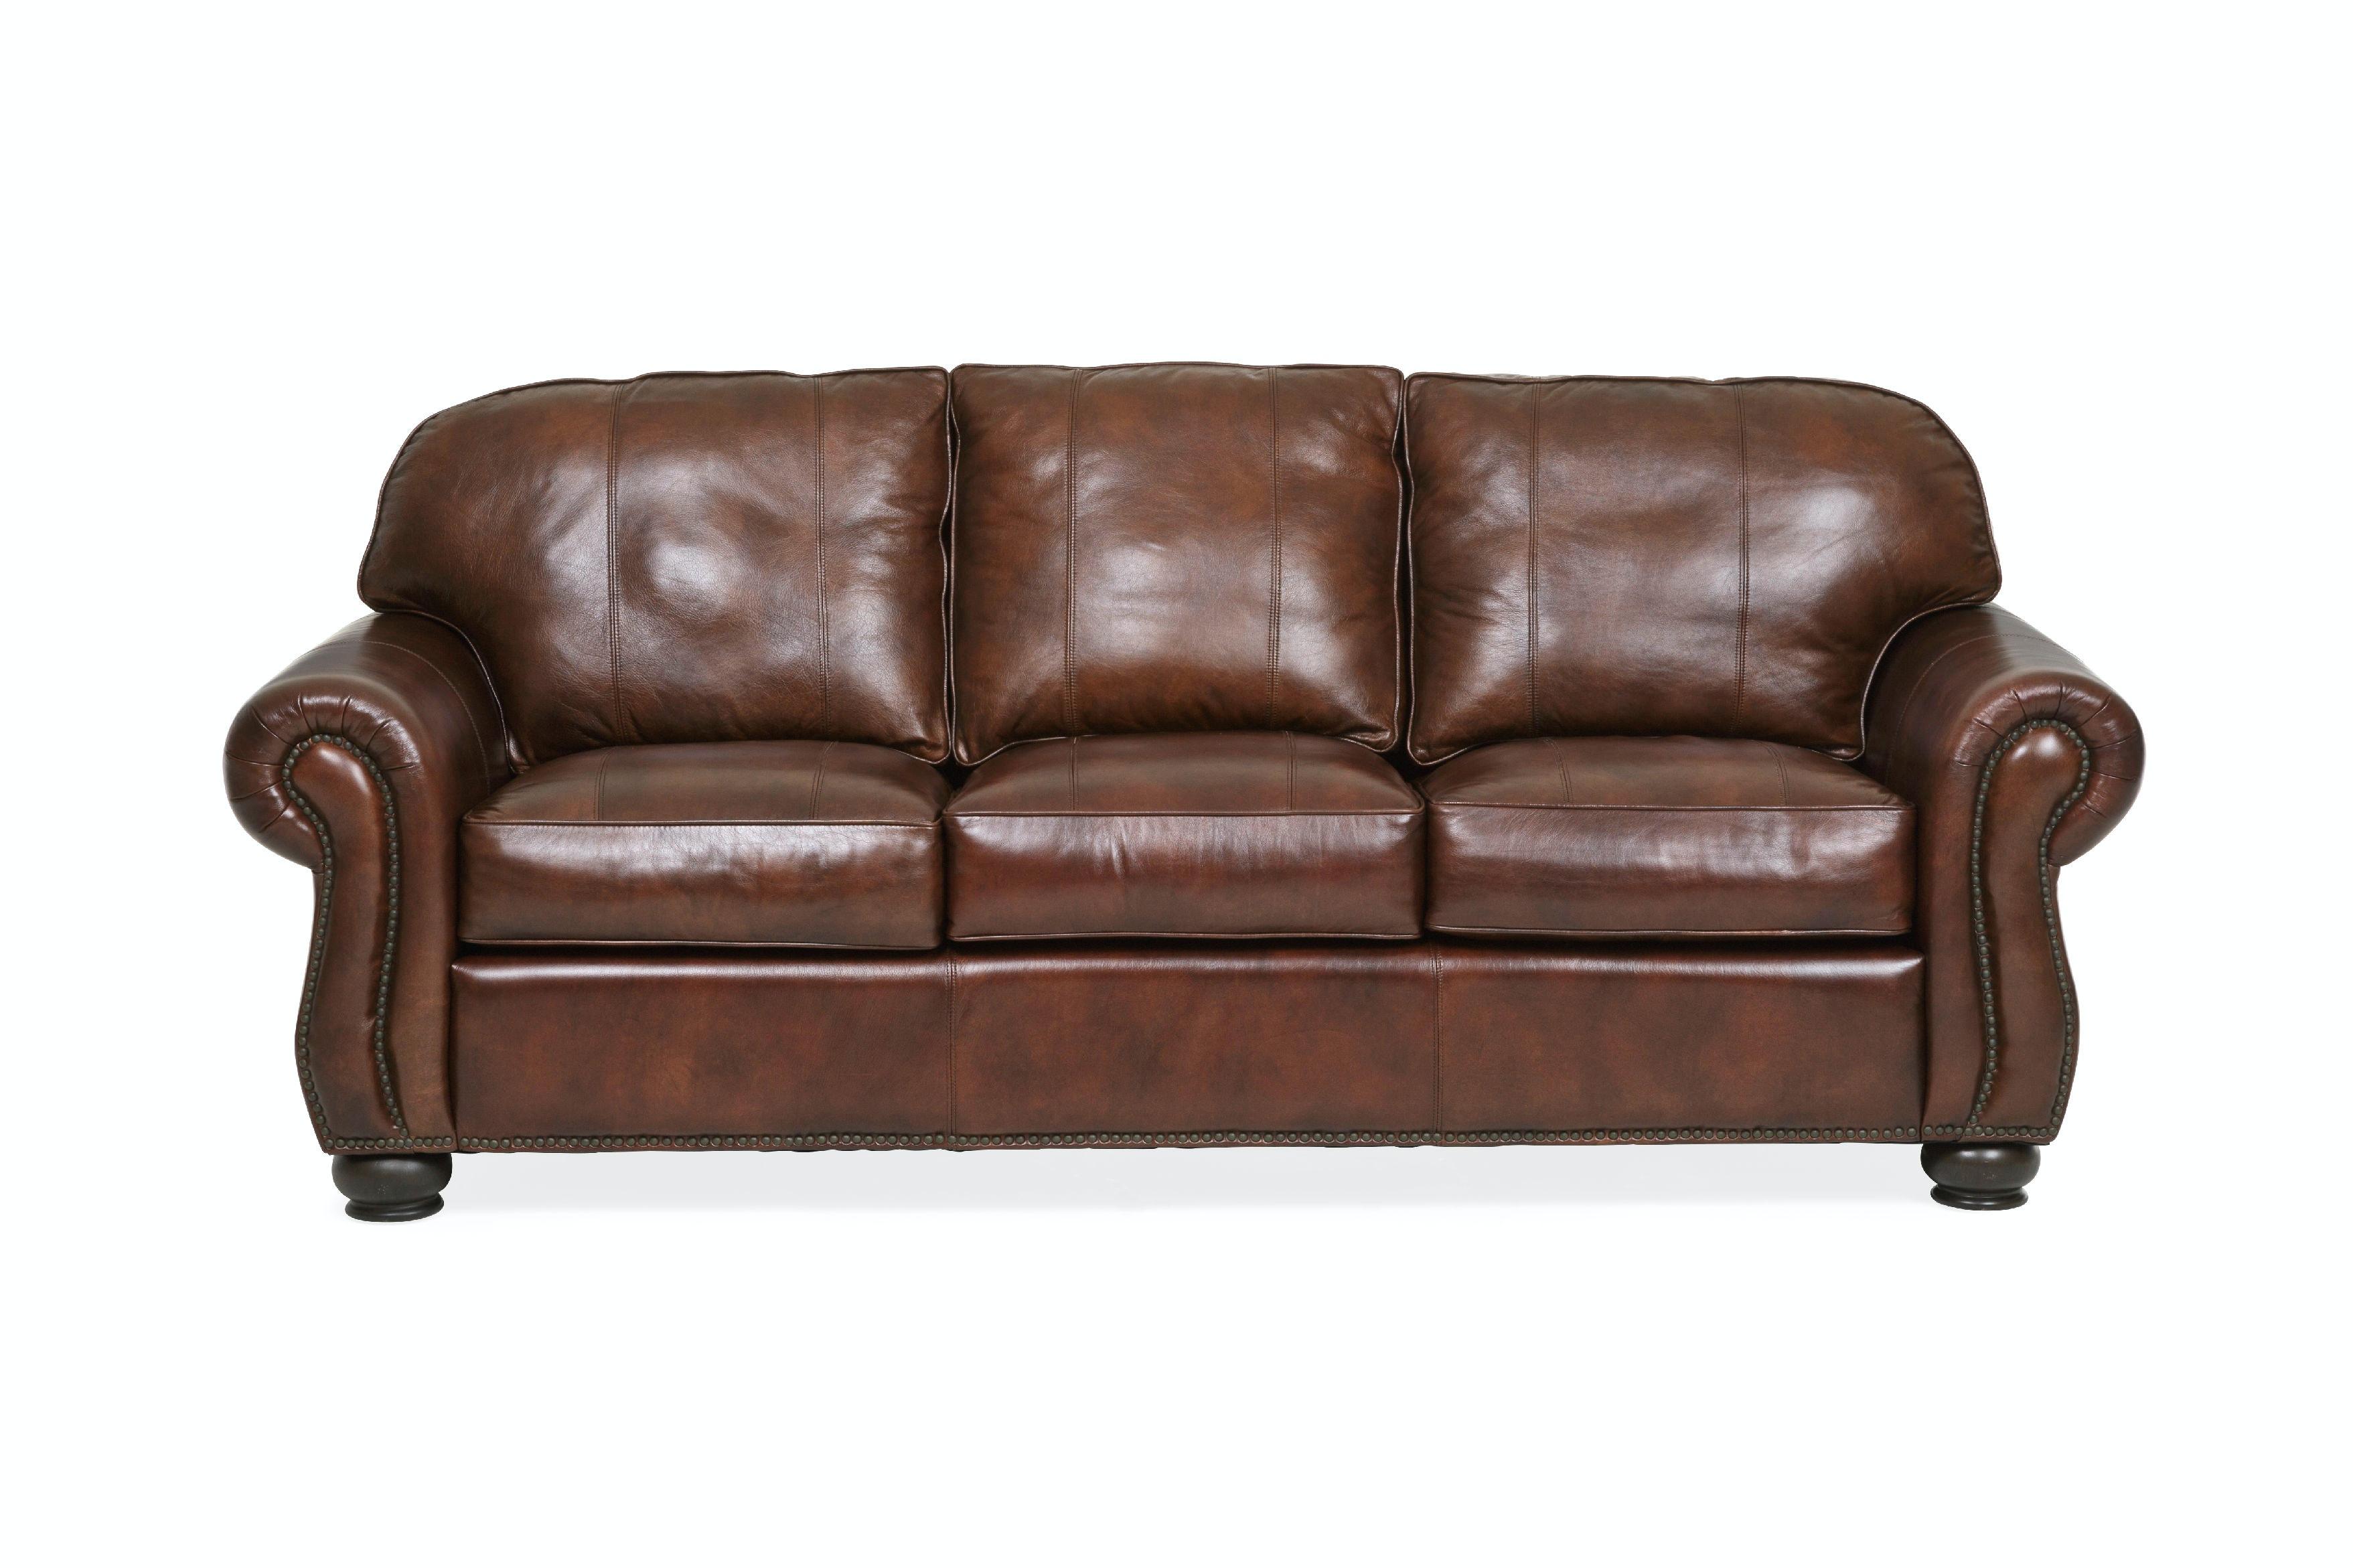 star furniture sofas memory foam sofa bed mattress leather houston tx living room